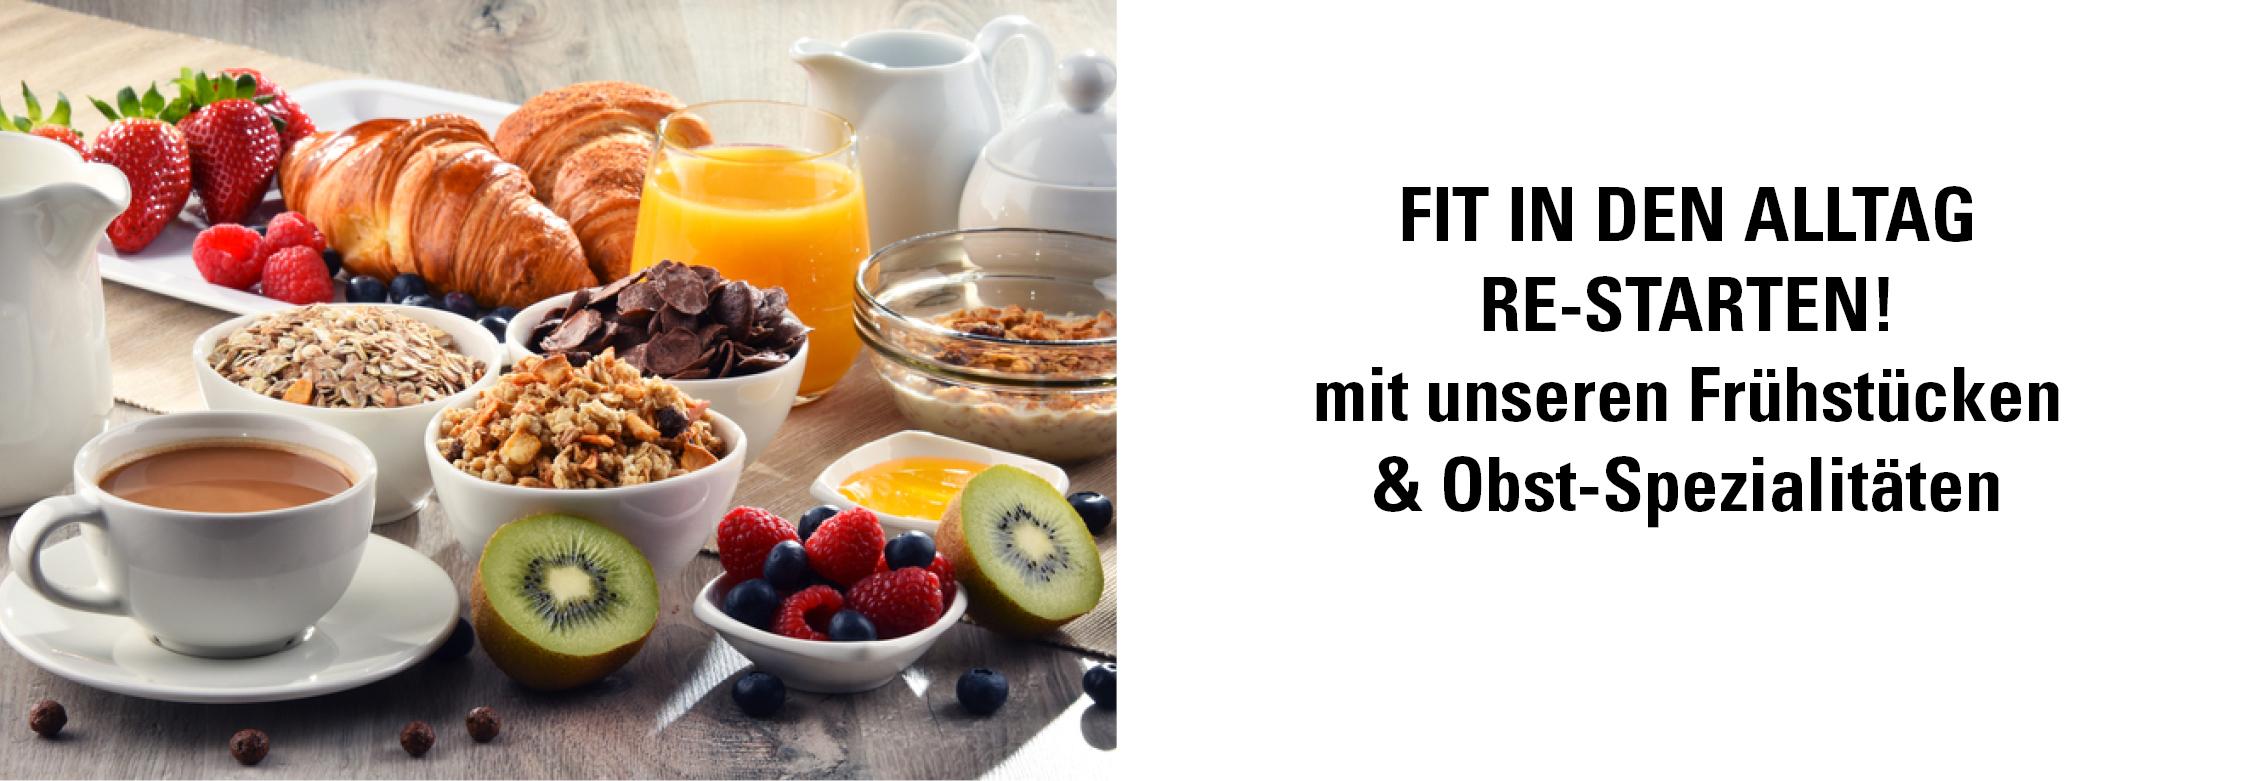 Frühstück bestellen bagel company business catering berlin